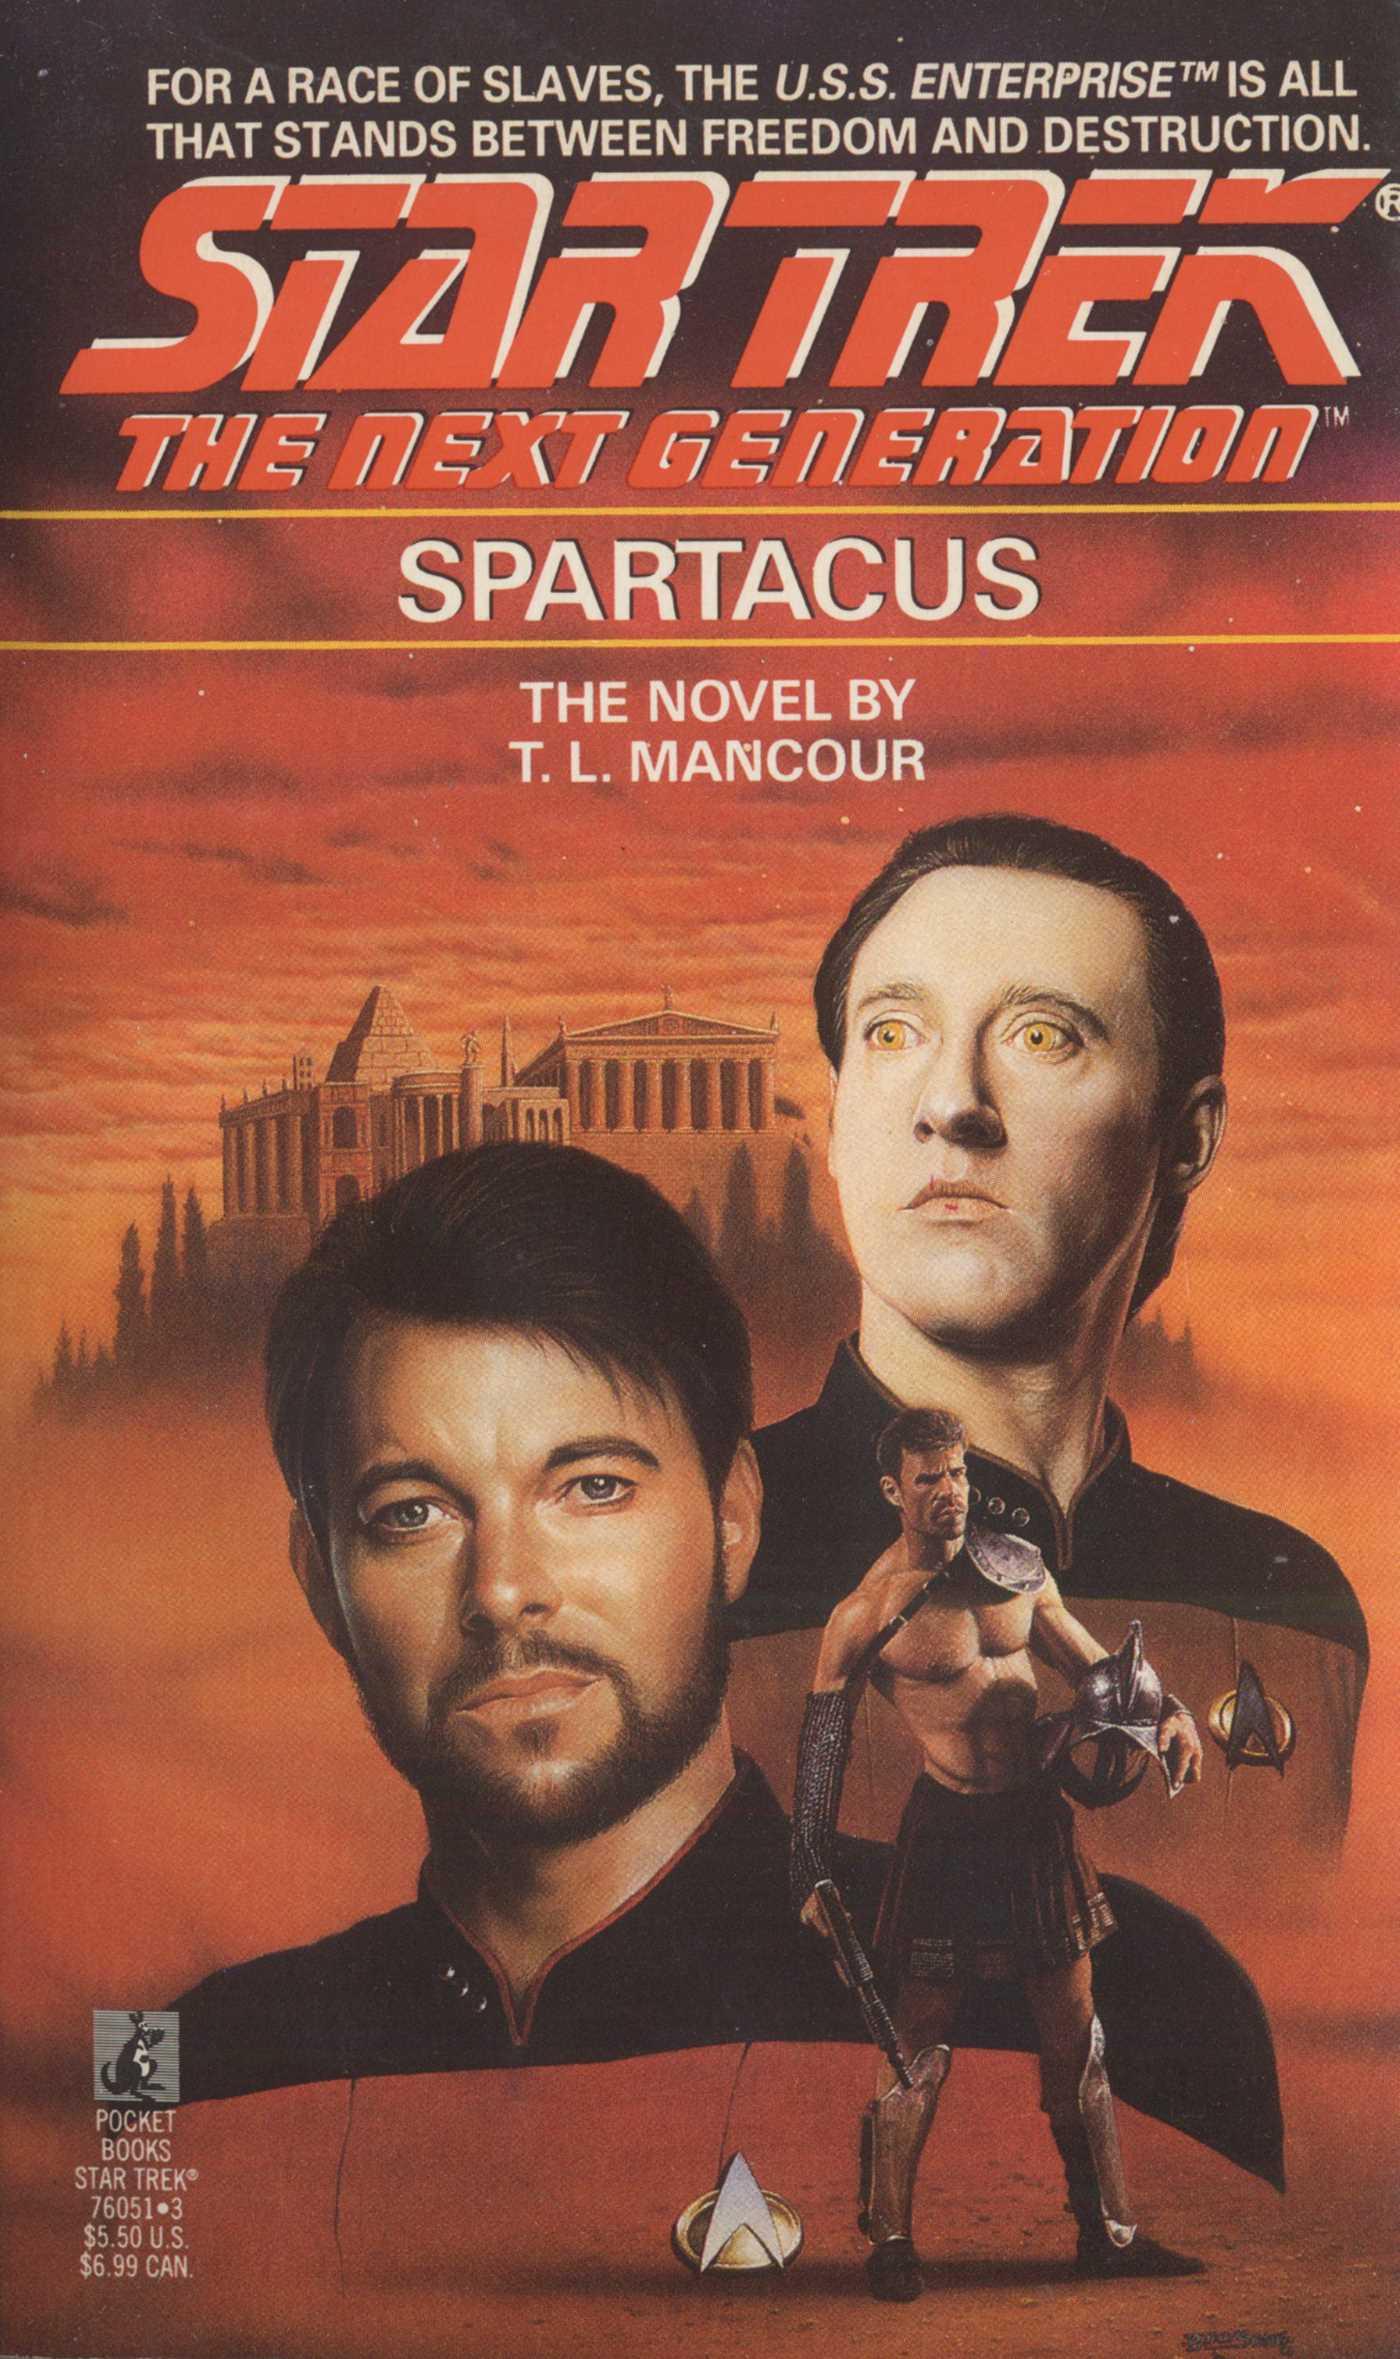 Spartacus 9780743421003 hr